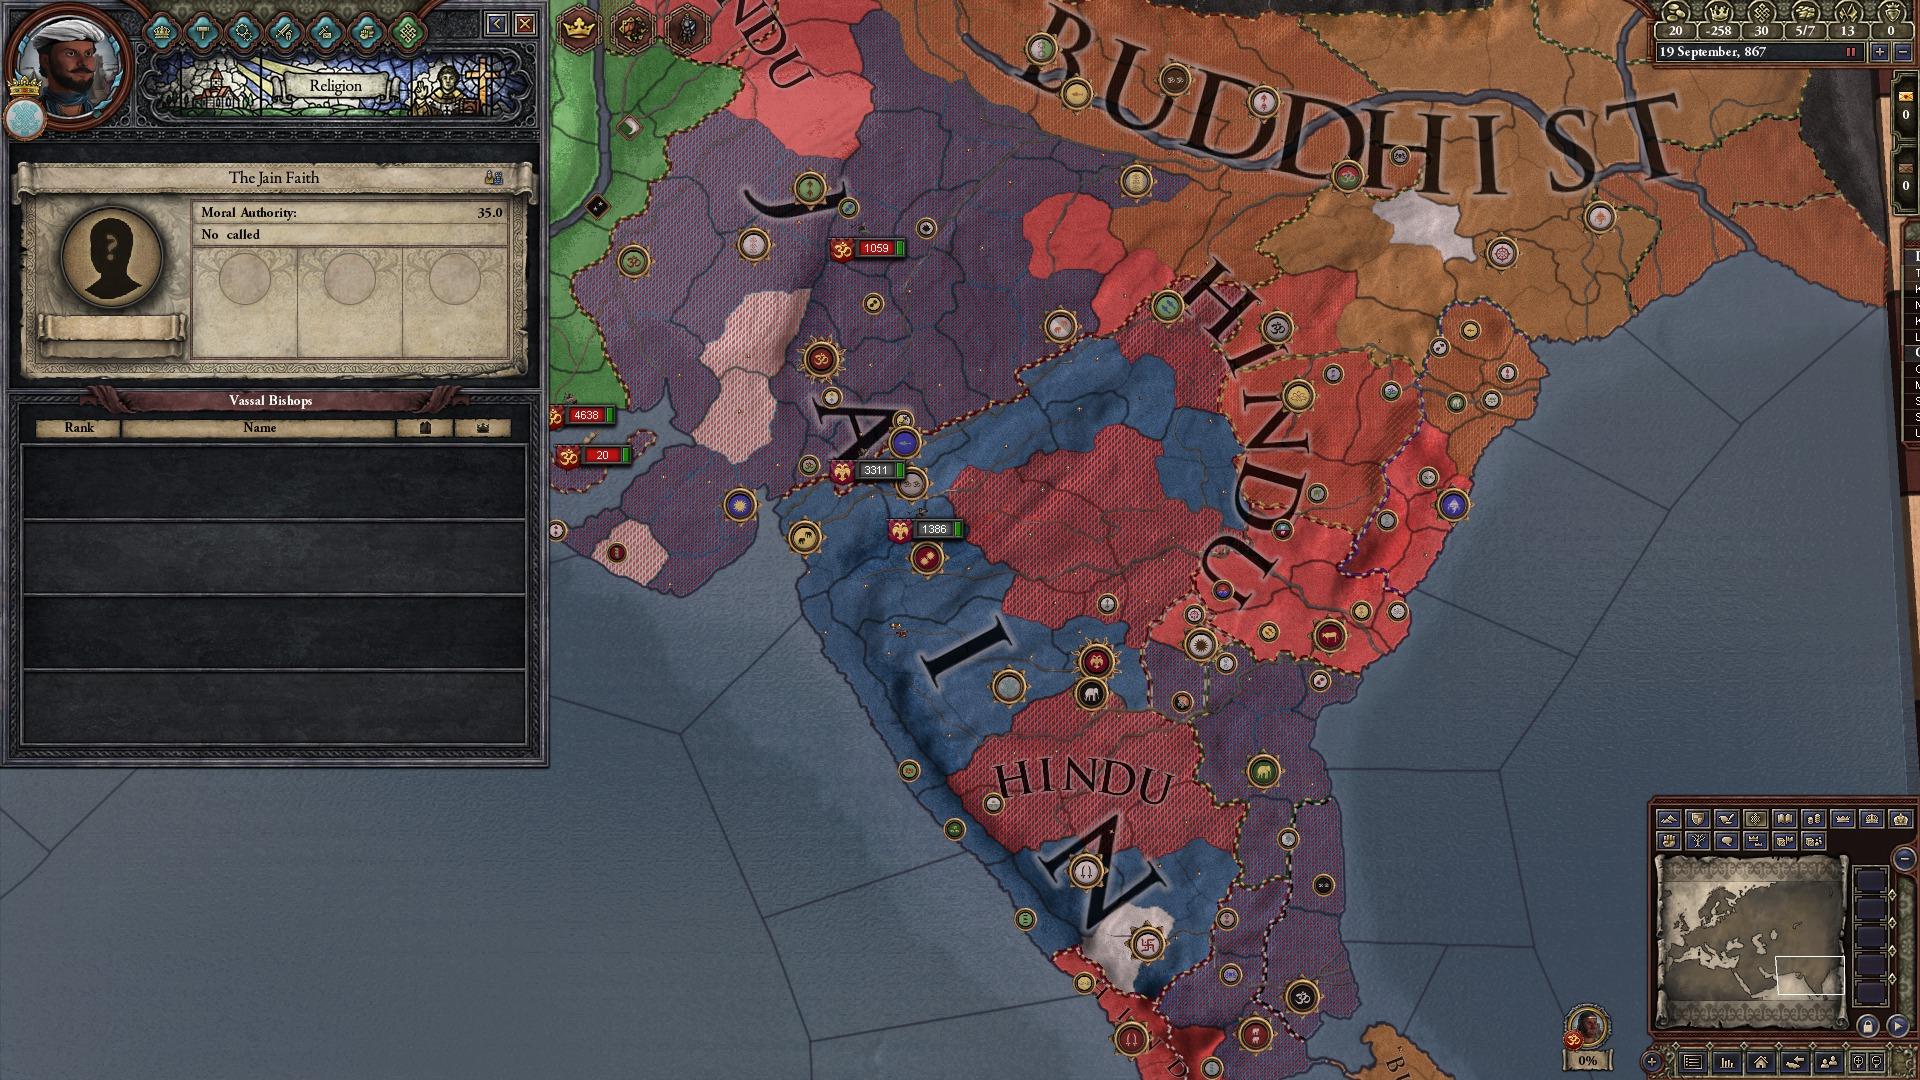 Crusader Kings II: Songs of India screenshot